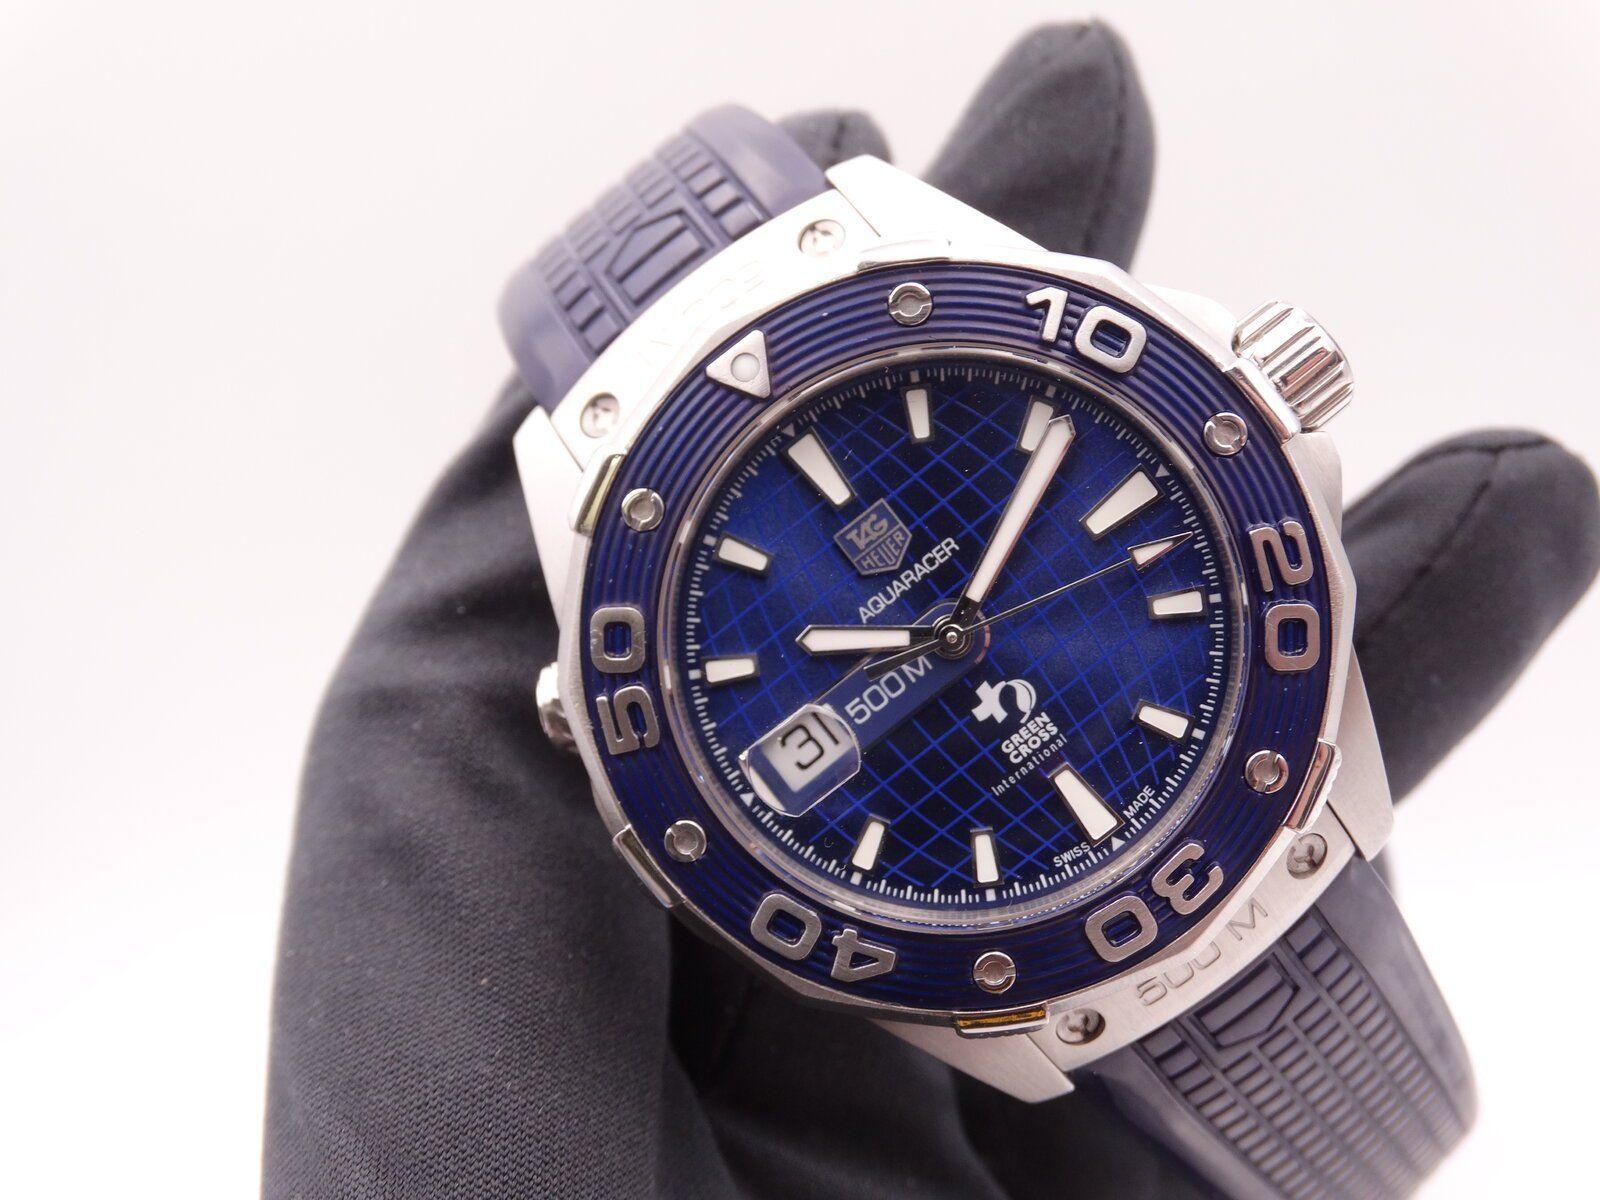 Tag Heuer Aquaracer 500 Dicaprio Green cross Blue Limited 01271.JPG